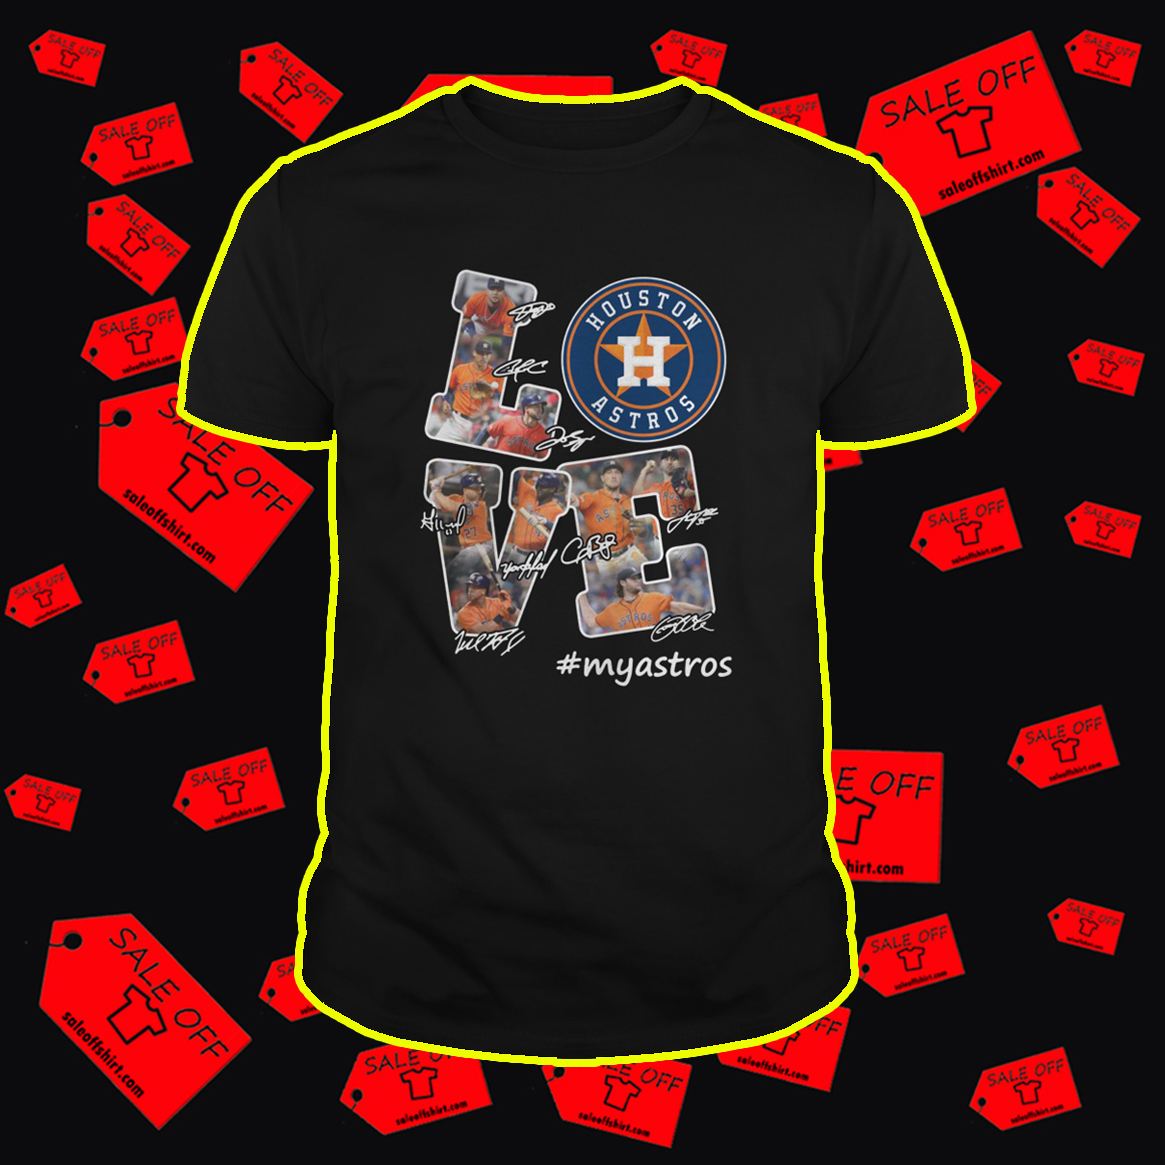 Love Houston Astros #myastros shirt